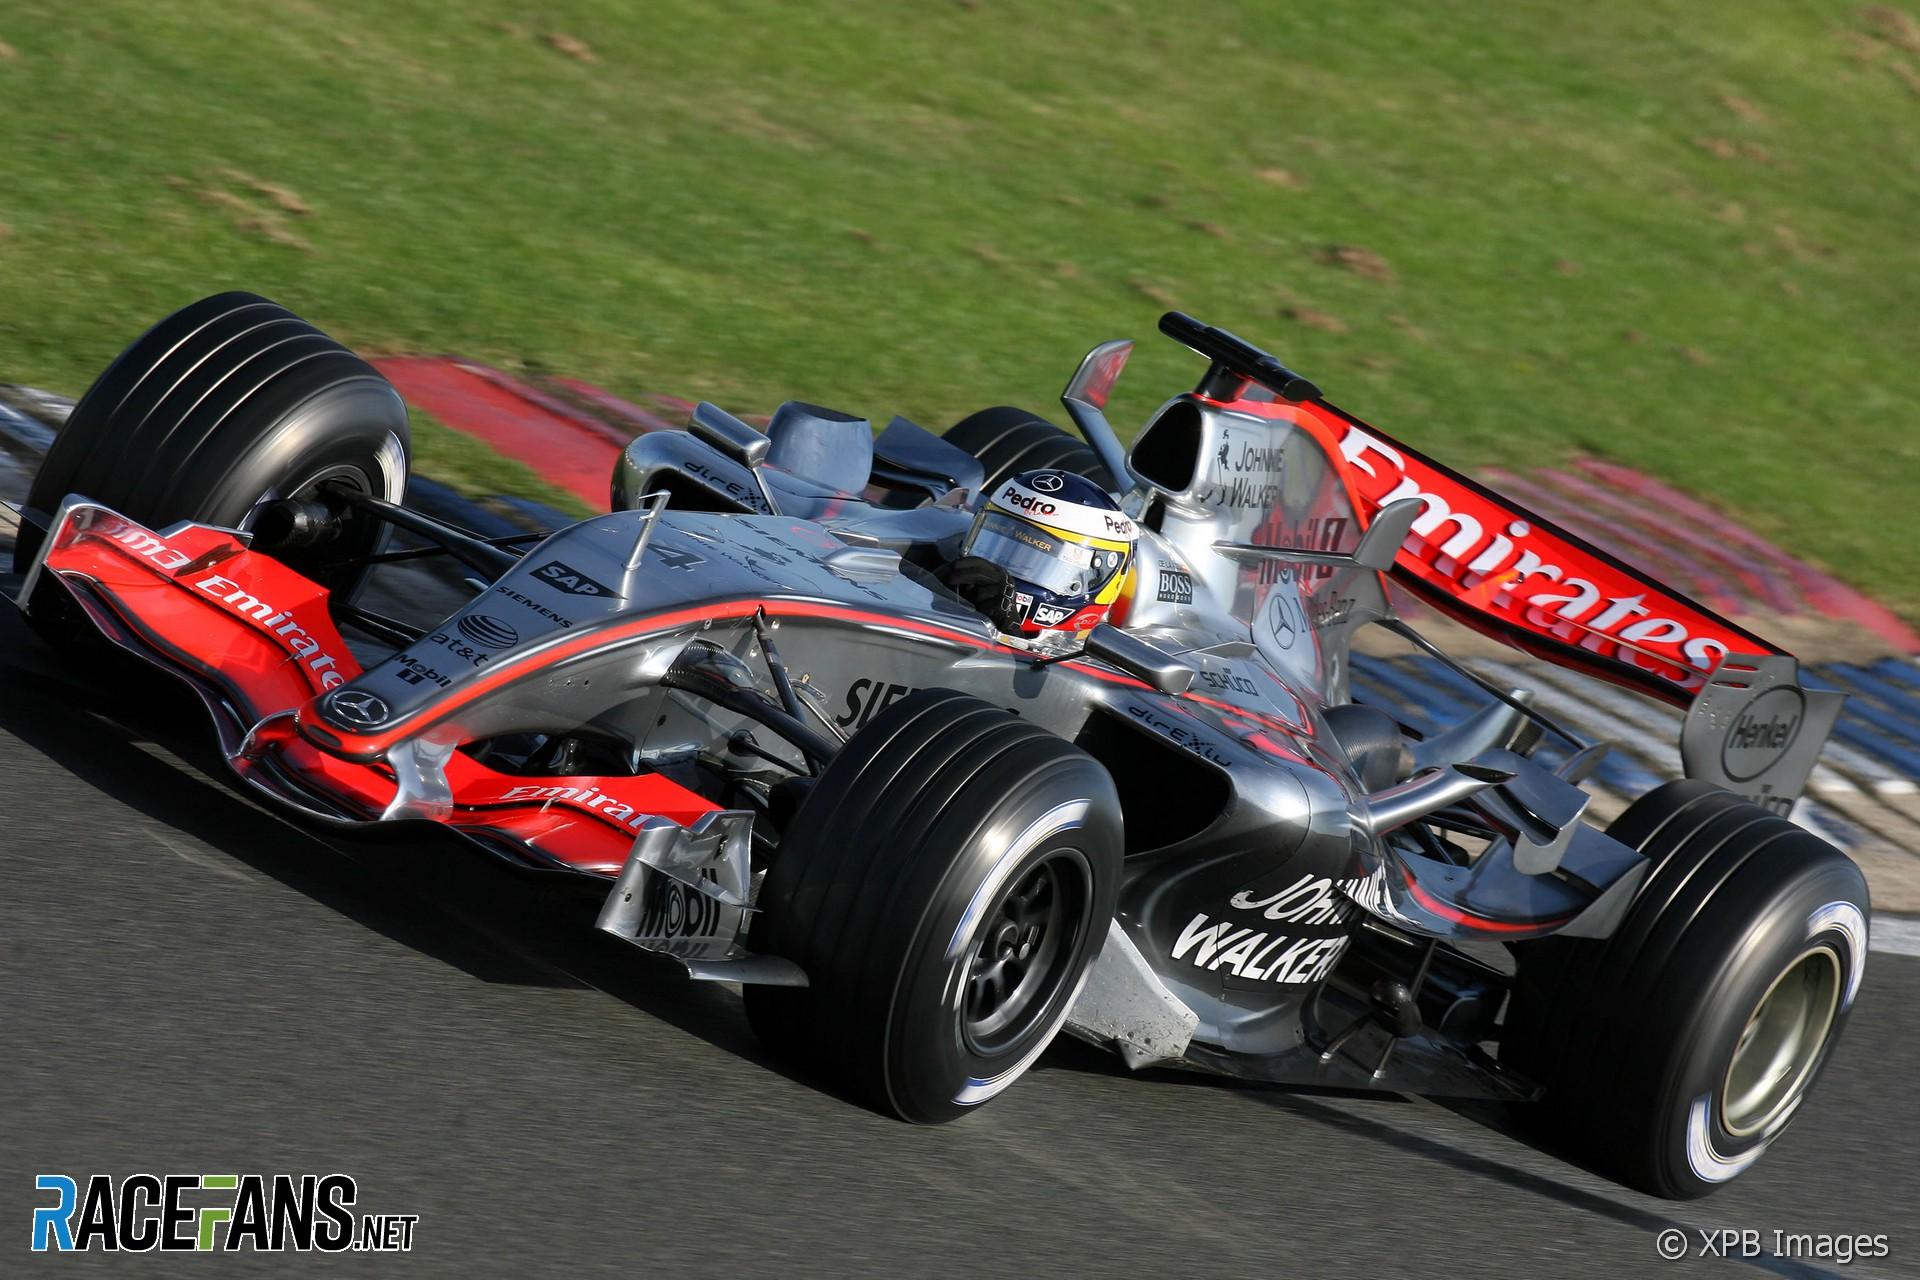 Pedro de la Rosa, McLaren, Silverstone, 2006